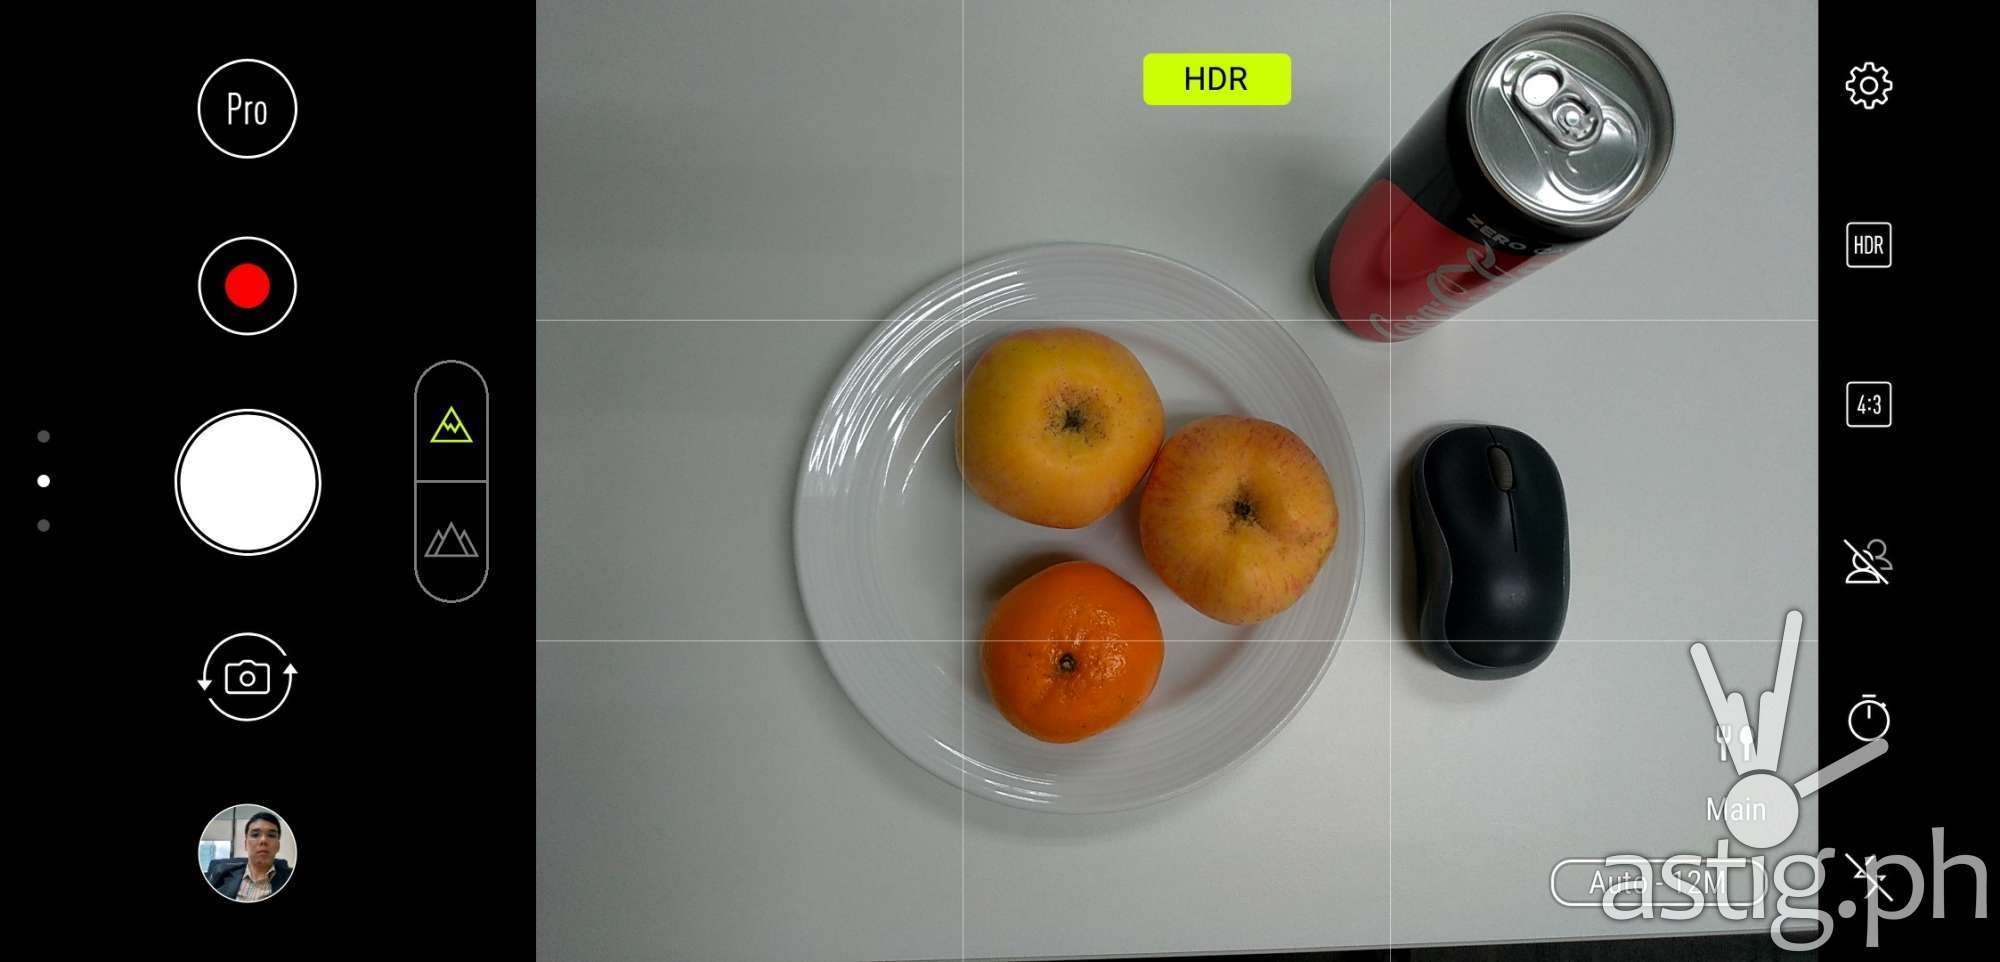 Zenfone 5 PixelMaster camera Auto mode AI scene detection